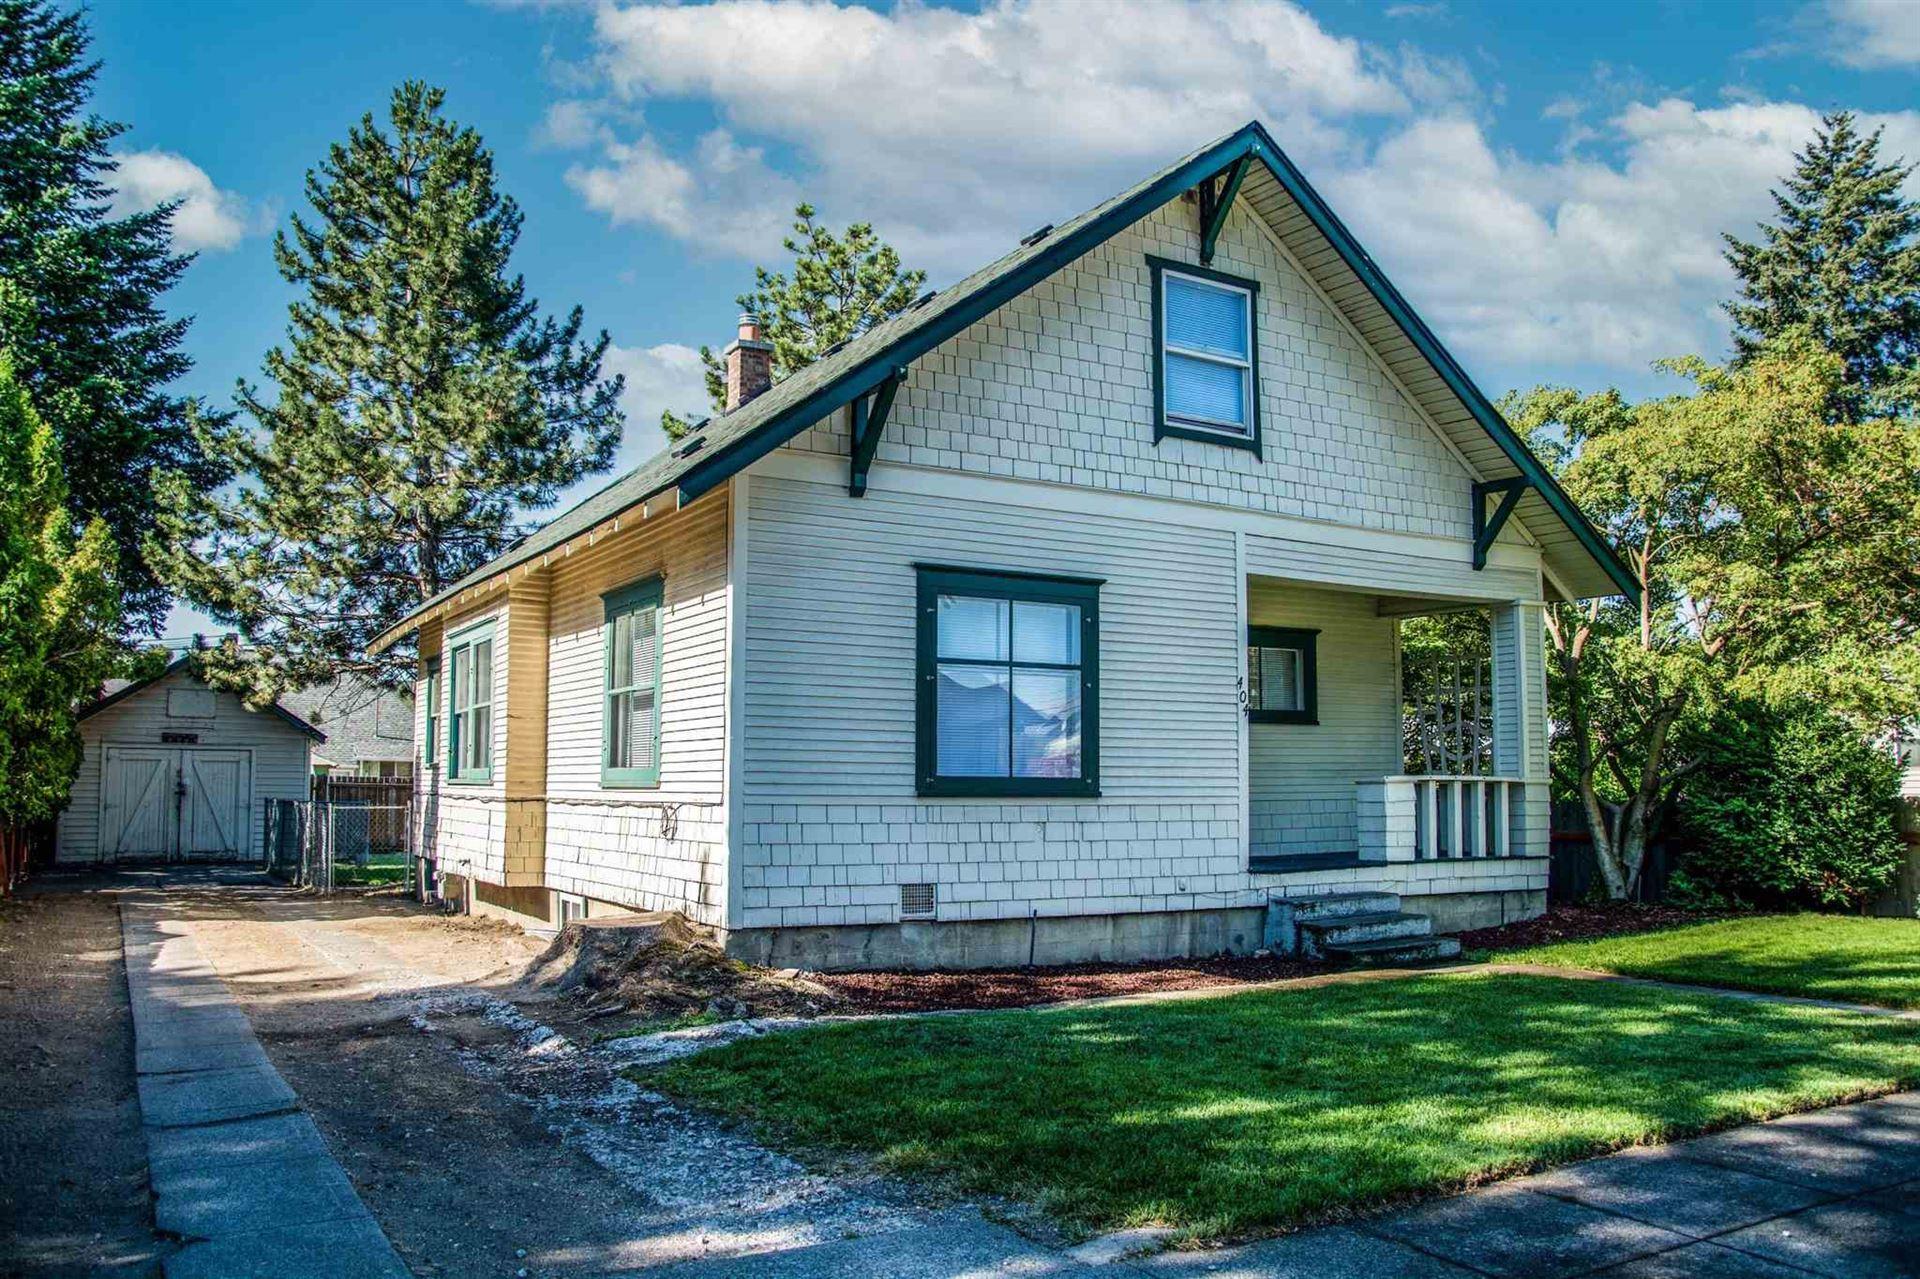 404 E Broad Ave, Spokane, WA 99207 - #: 202118592